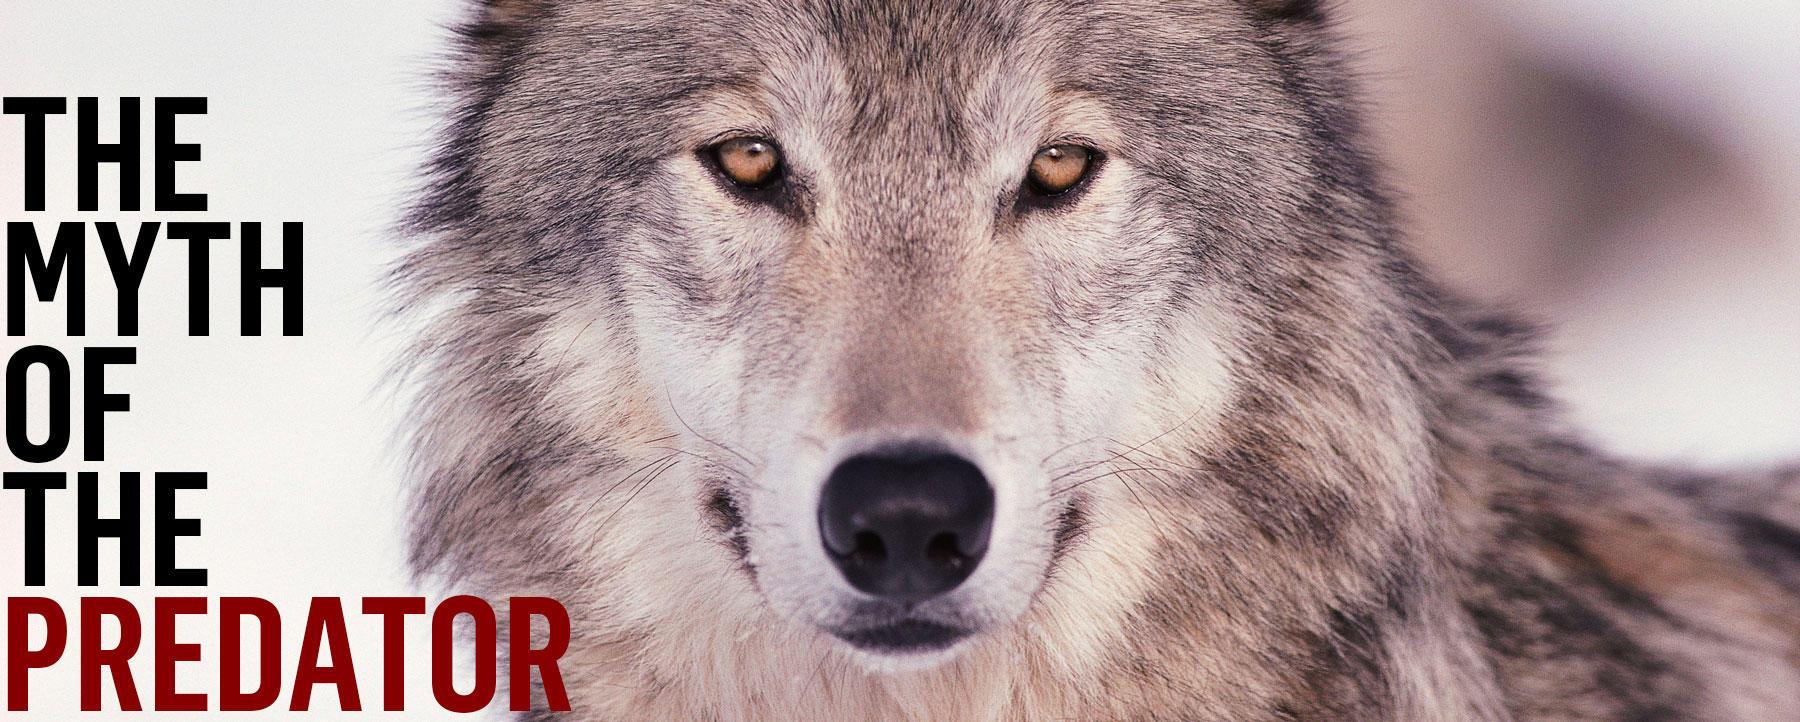 Myth of the Predator